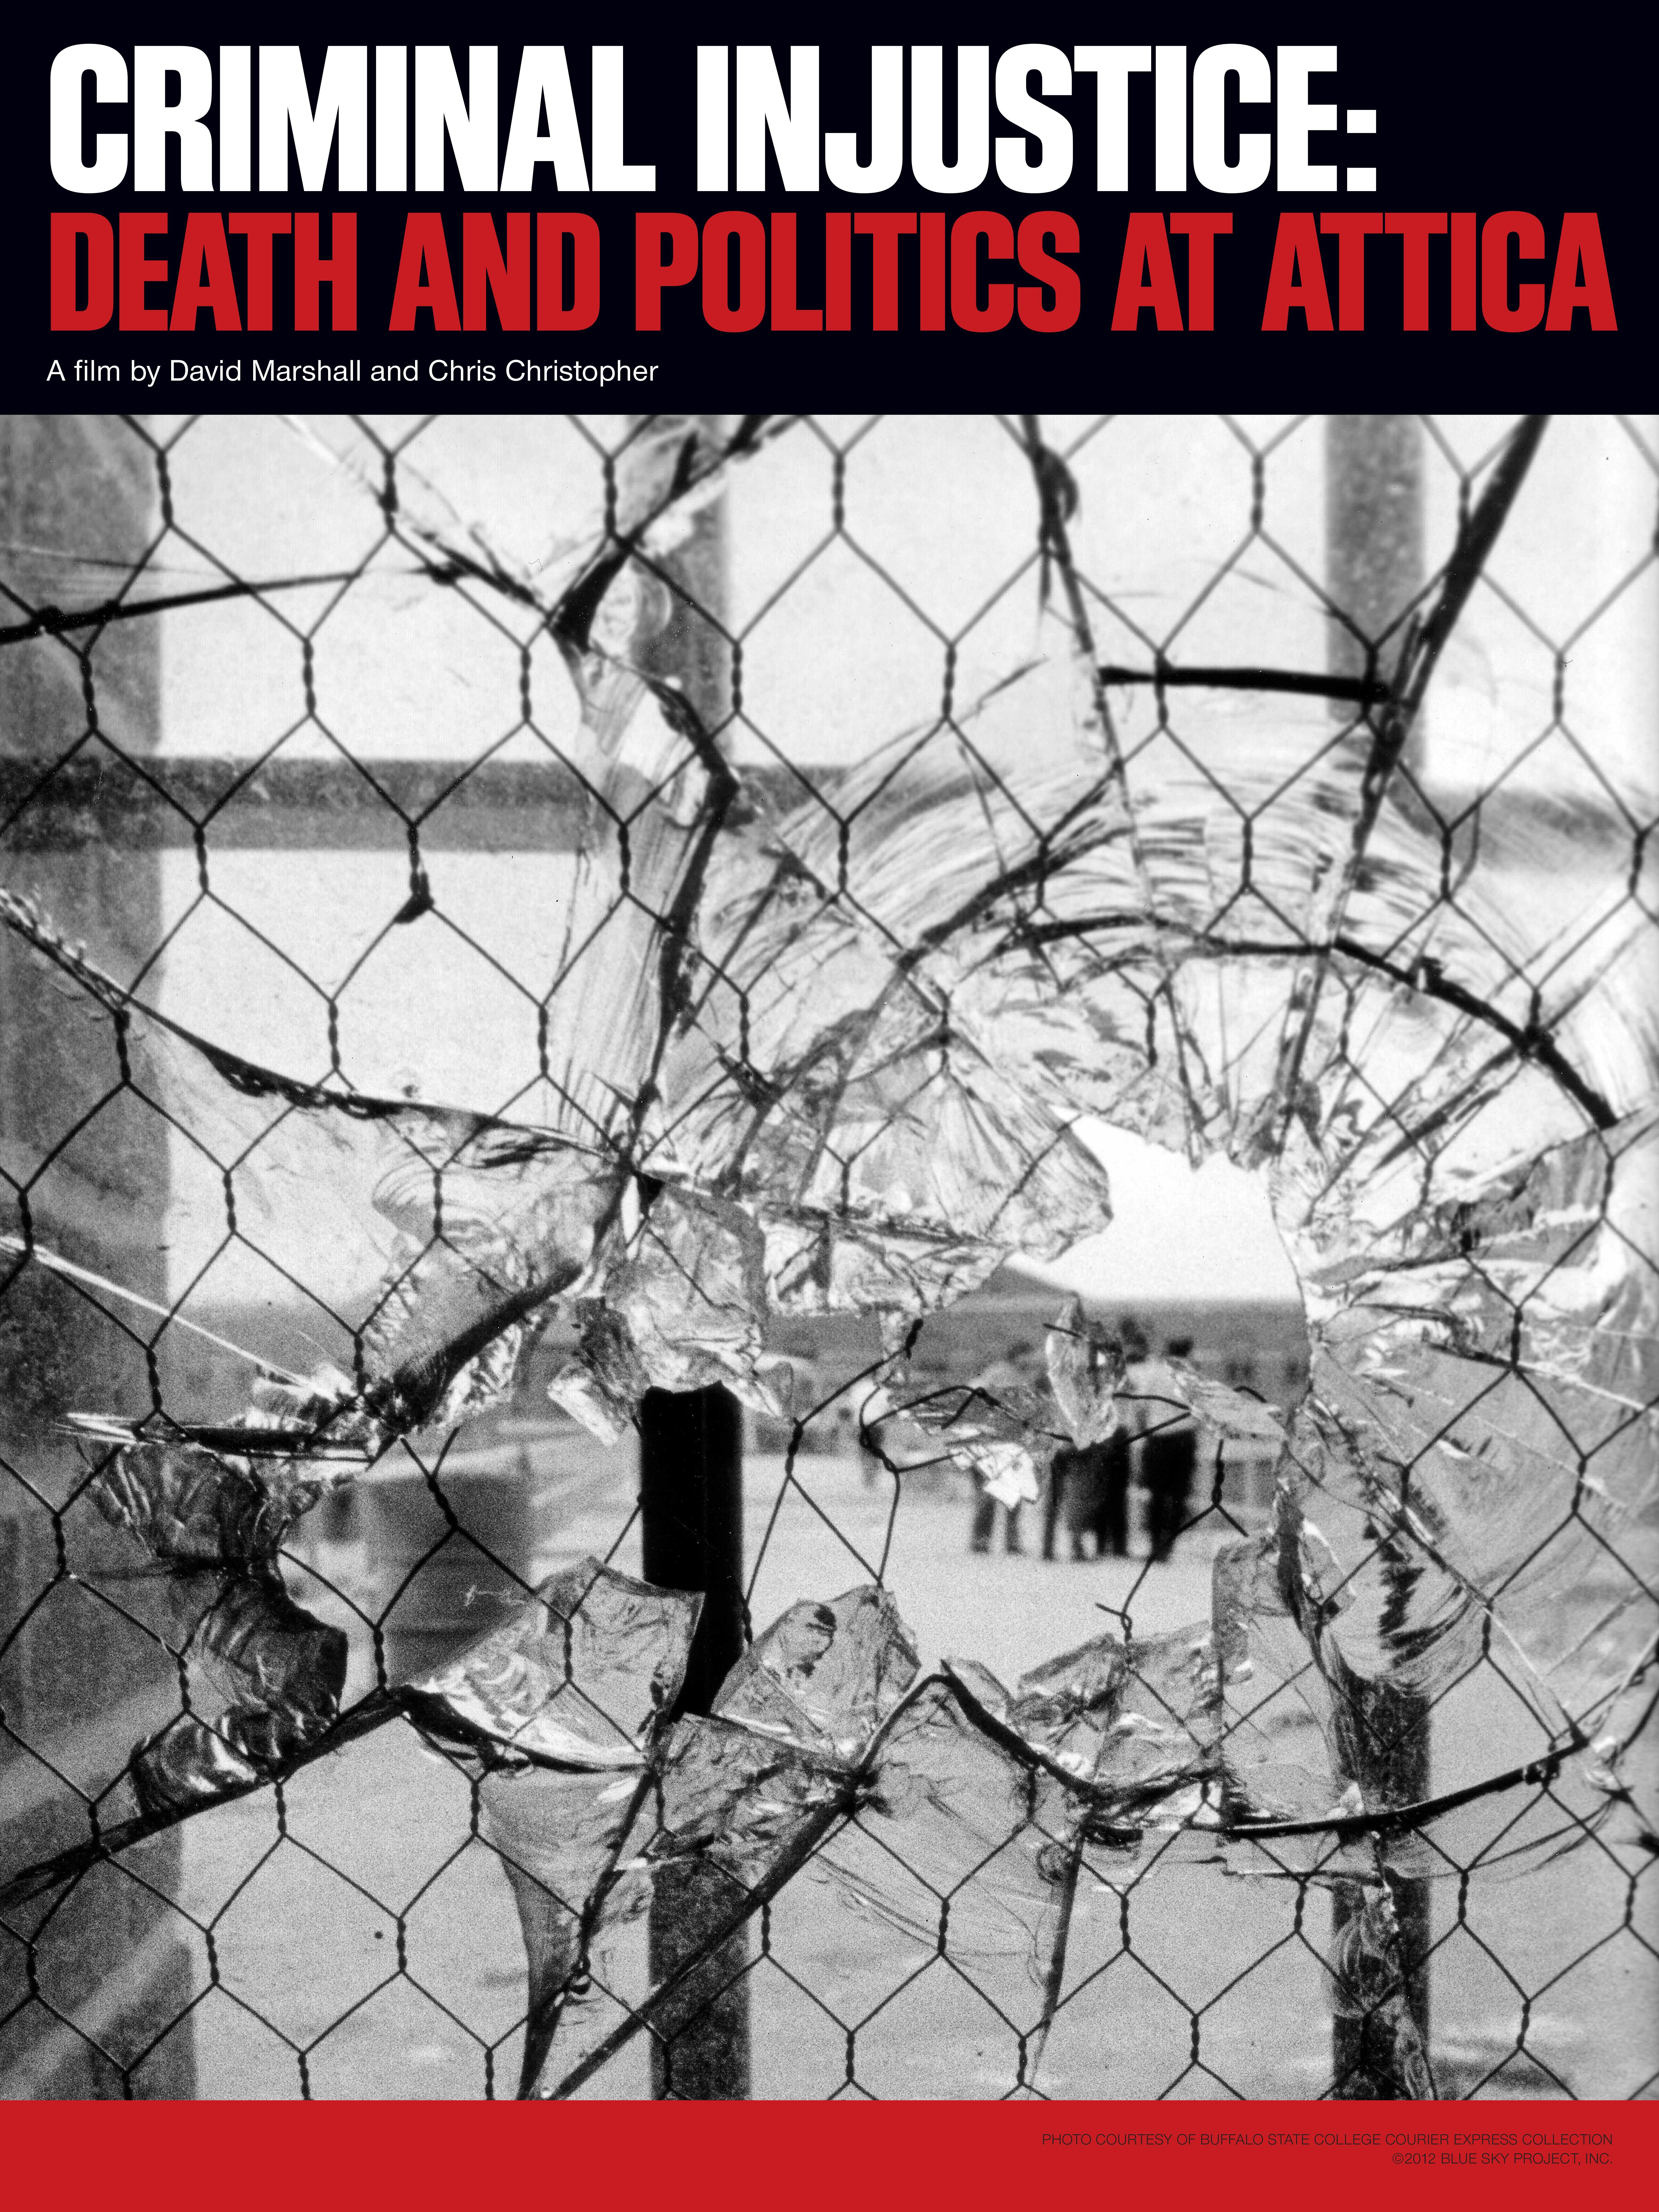 Criminal Injustice: Death and Politics at Attica